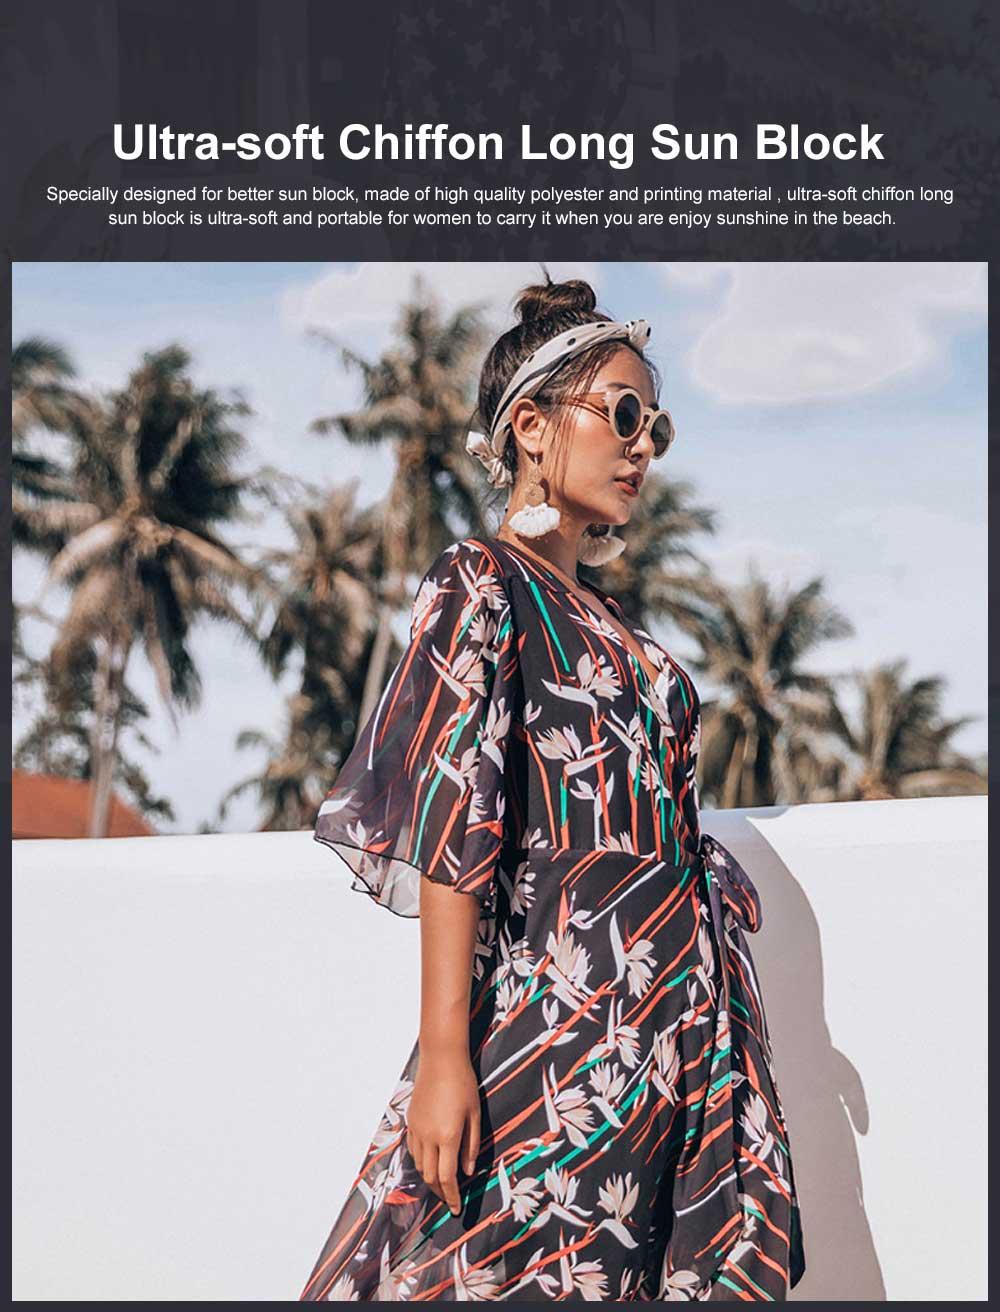 Comfortable & Ultra-soft Chiffon Long Sun Block for Beach Wear Bikini Tops for Women 0